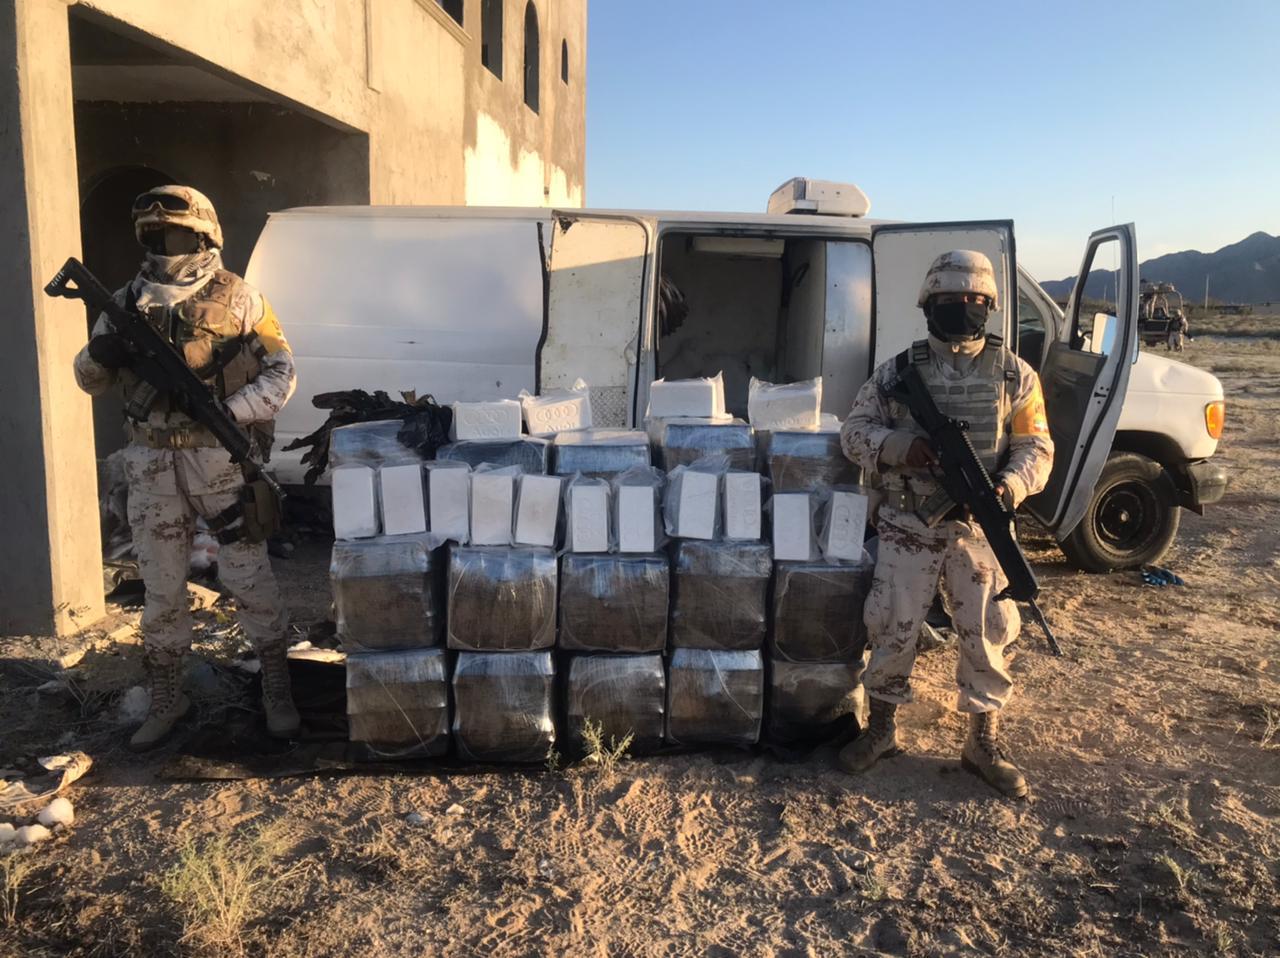 Narcos abandonan en San Felipe camioneta con cargamento de más de 135 MDP en drogas